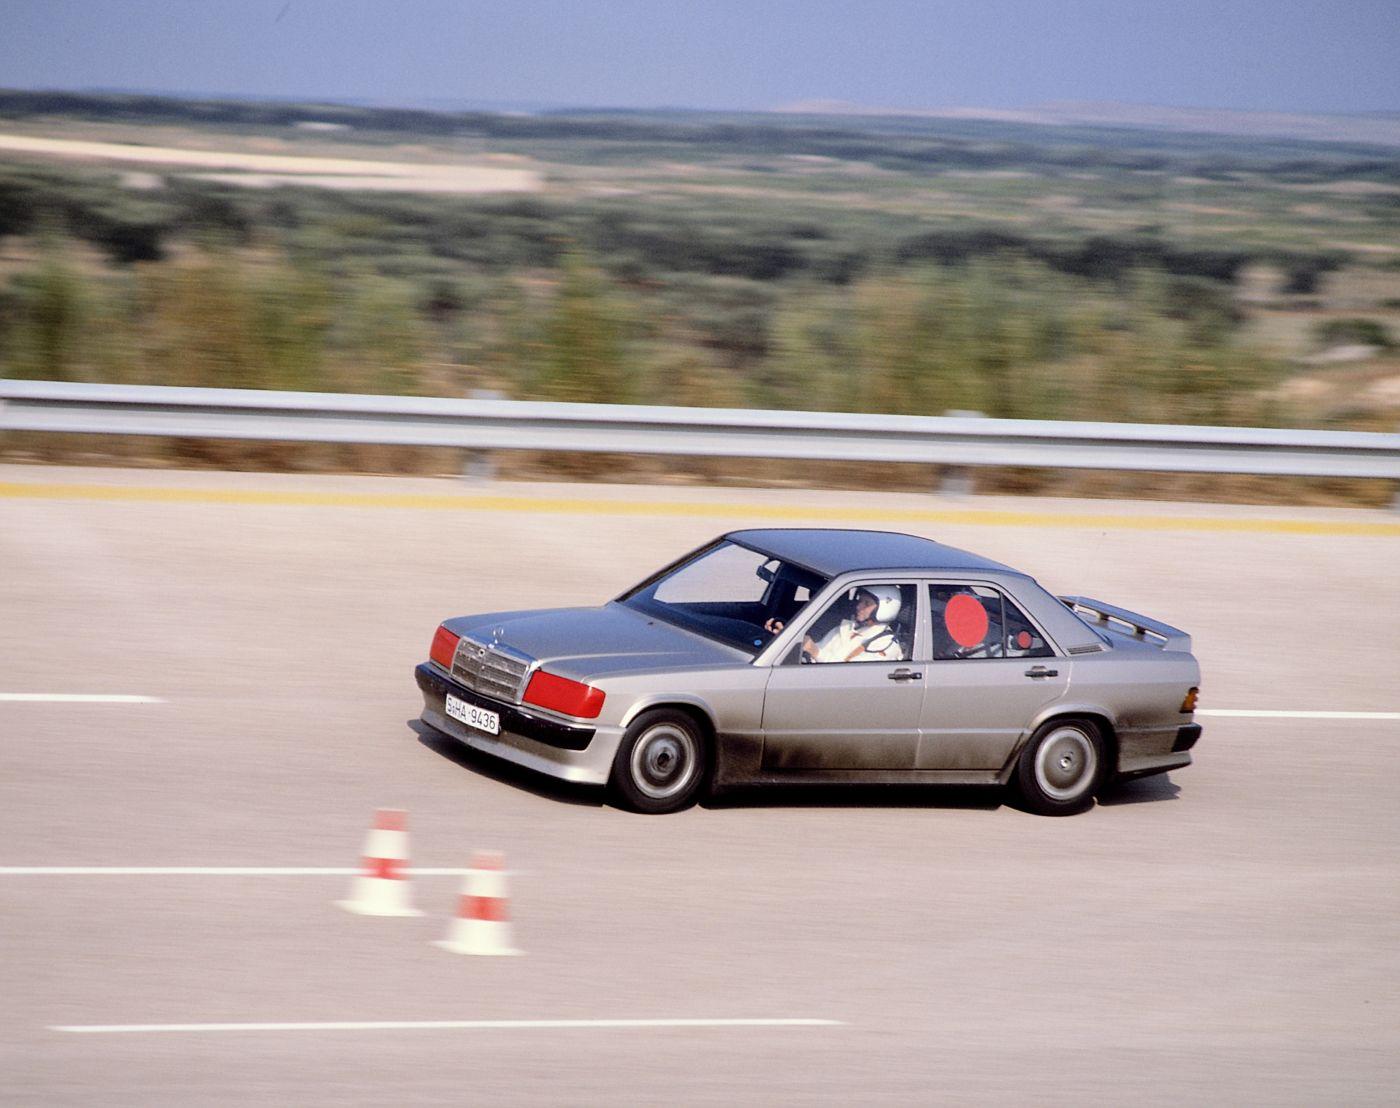 Mercedes-Benz 190 E 2.3 16 W 201 7